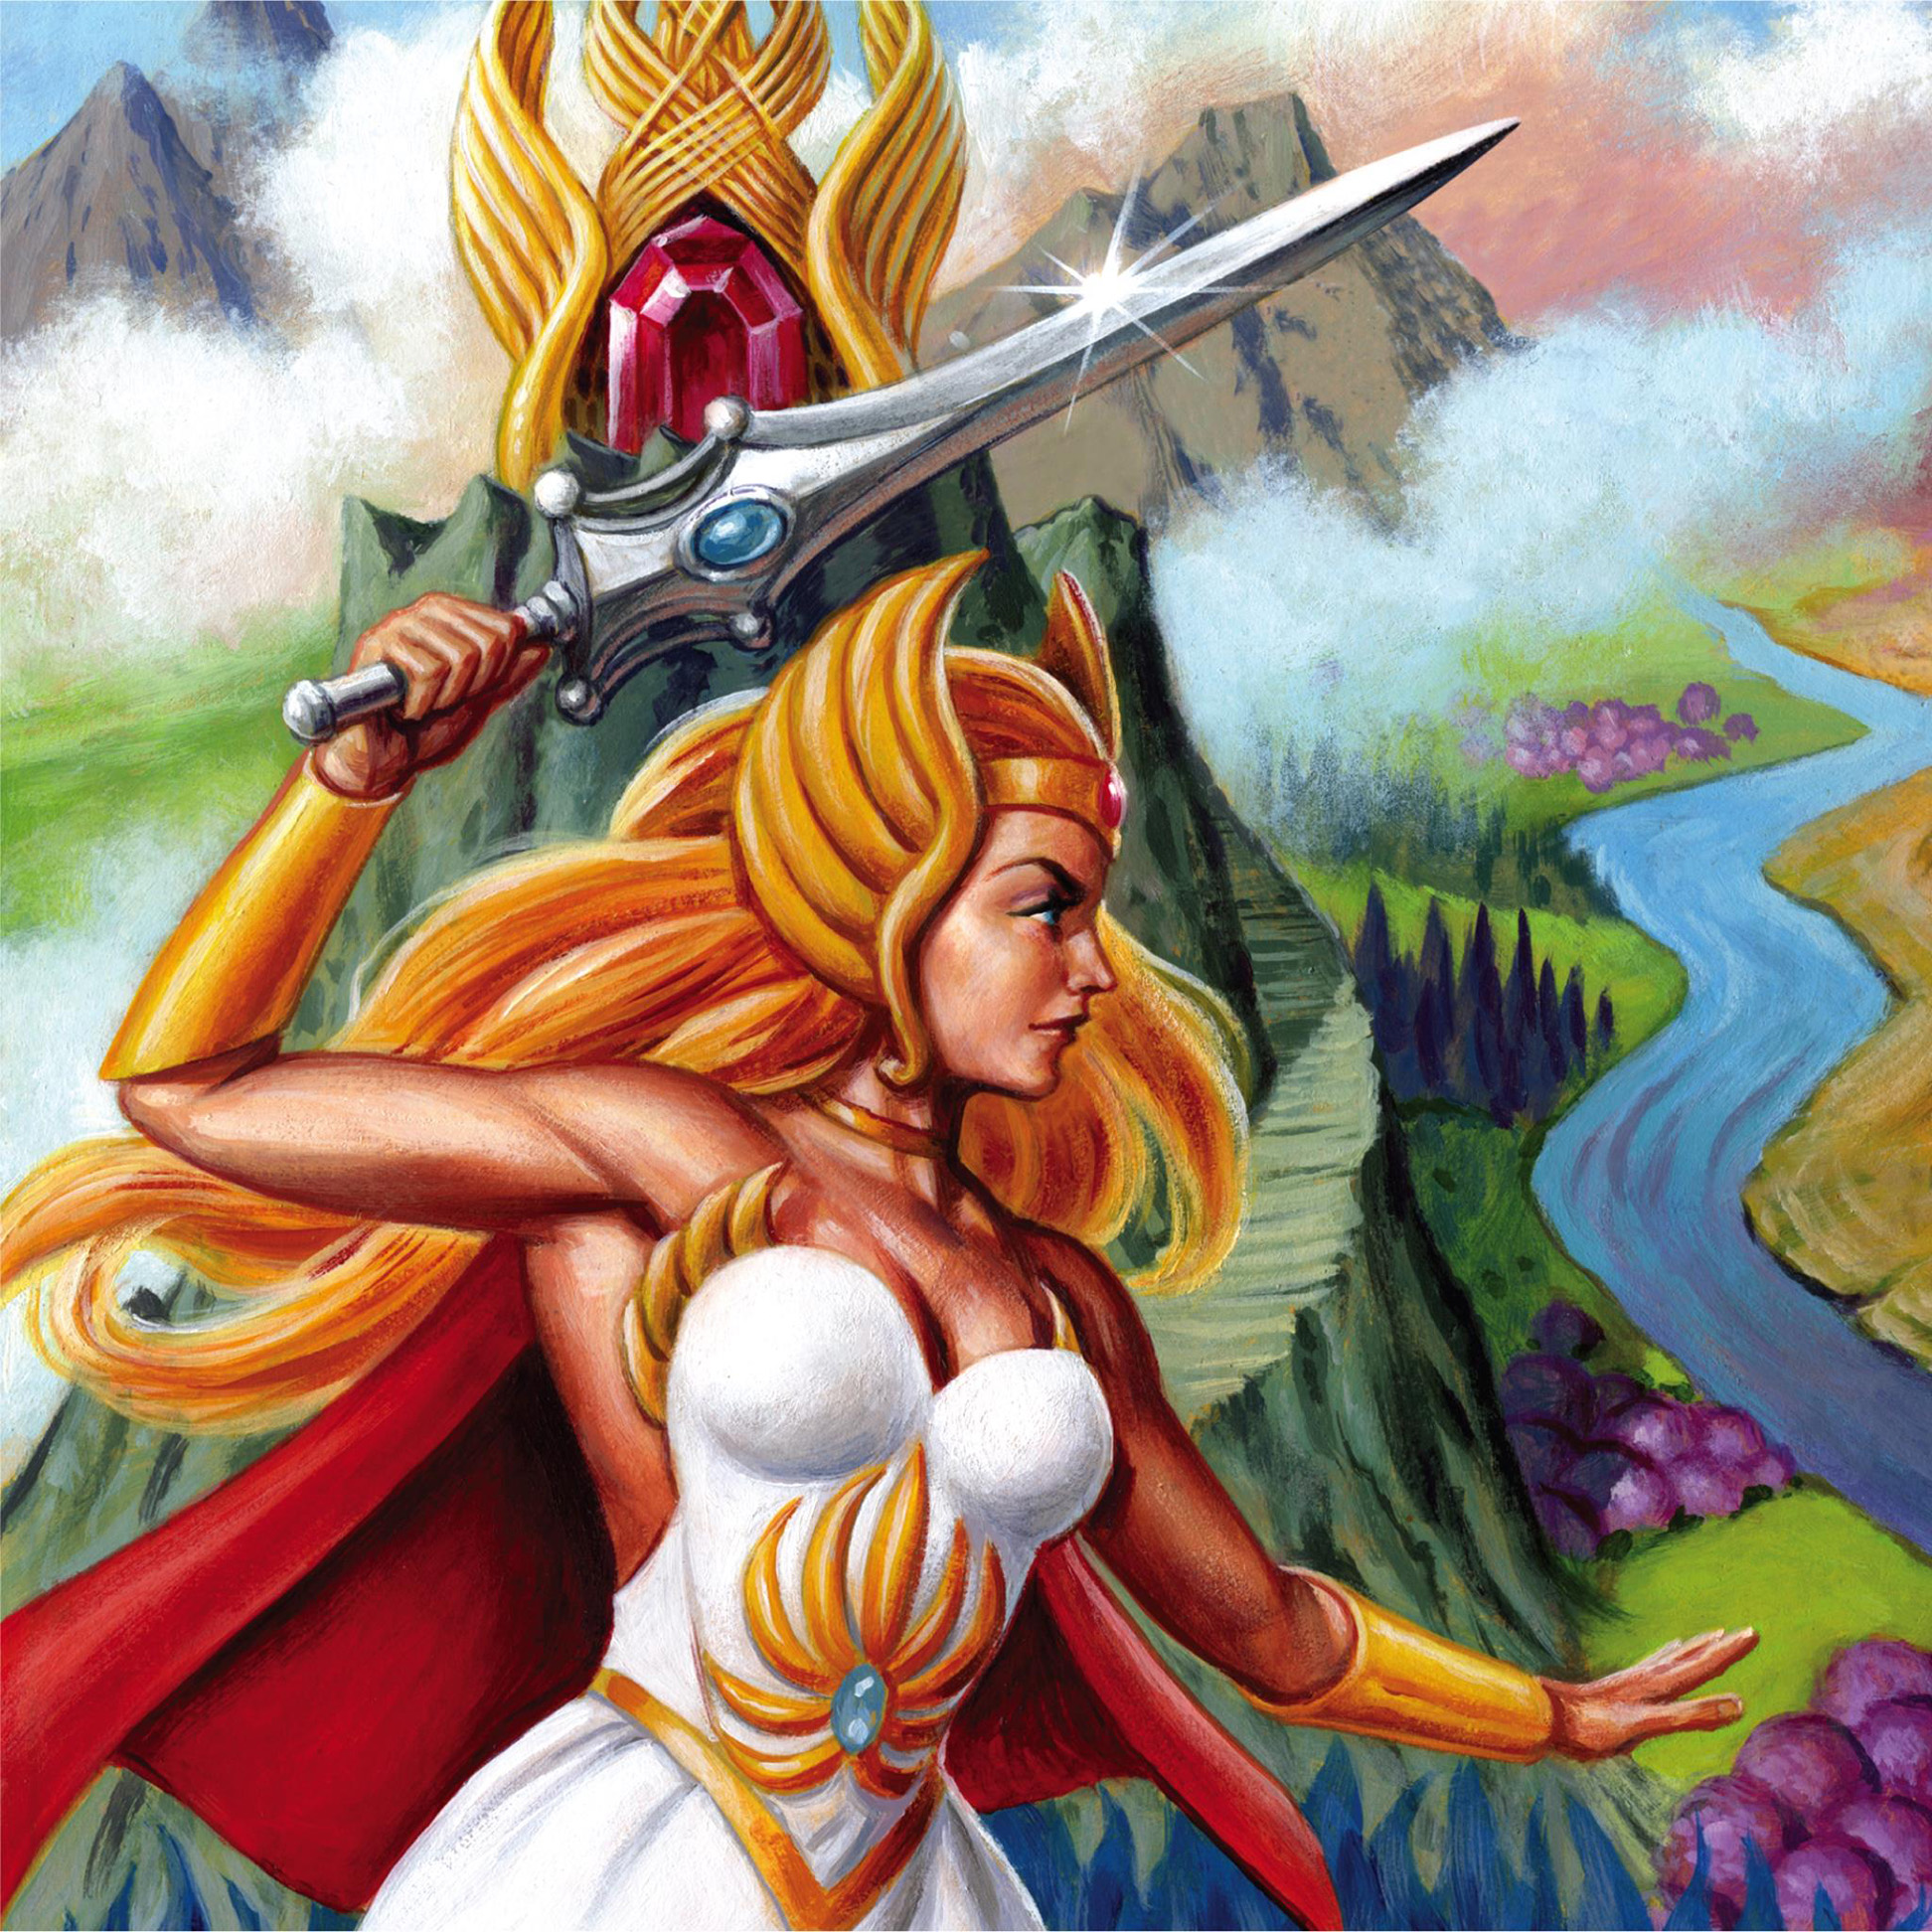 Super7 ReAction SDCC 2018 Exclusive Princess of Power She-Ra /& Hordak